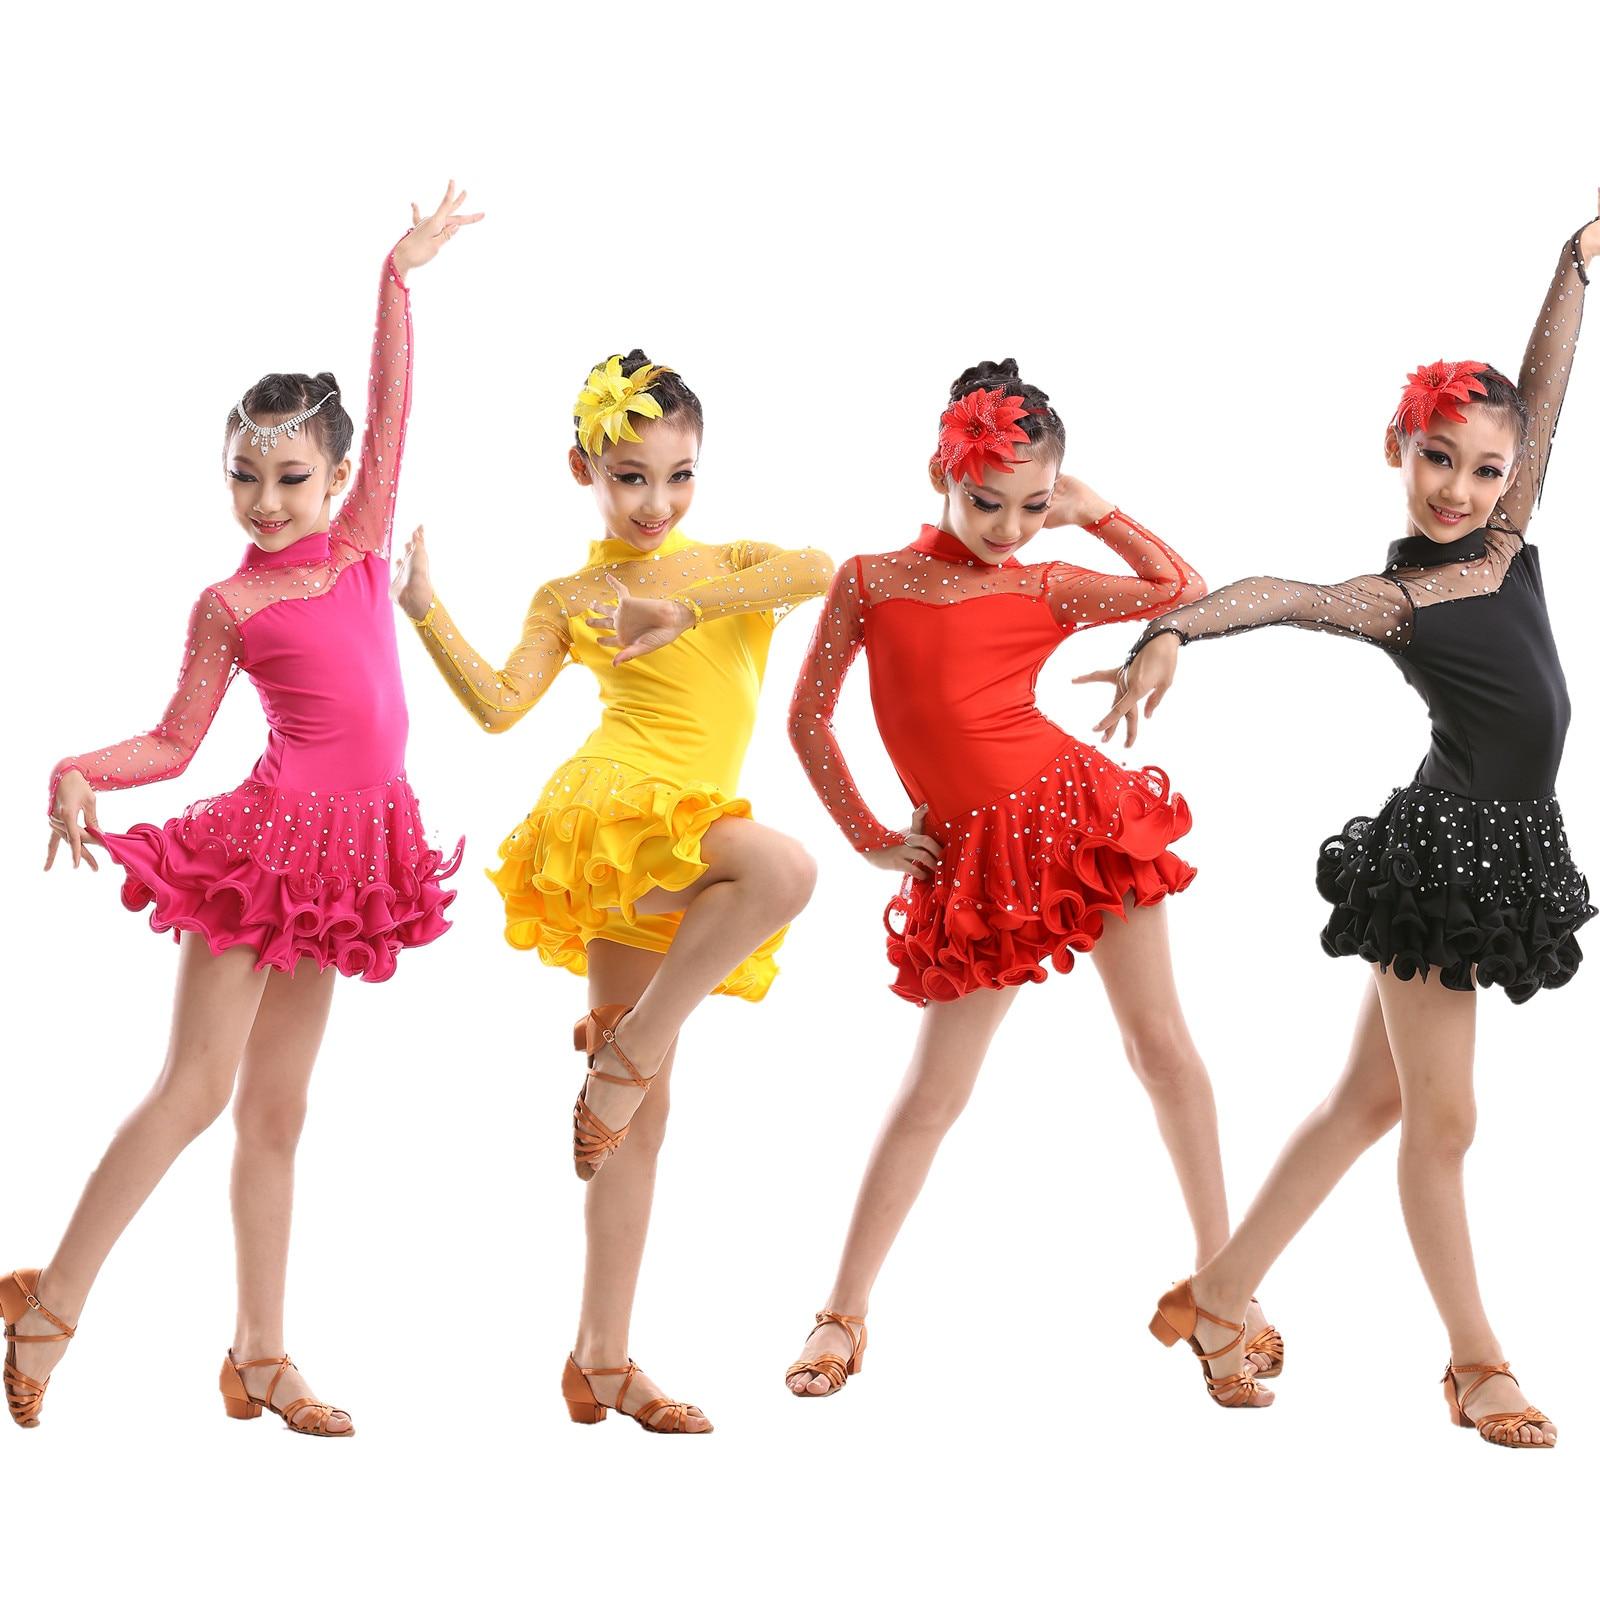 lace latin dress girls for competition rumba dress rumba dance tassel ballroom tango sexy costumes dance wear kids salsa fringe